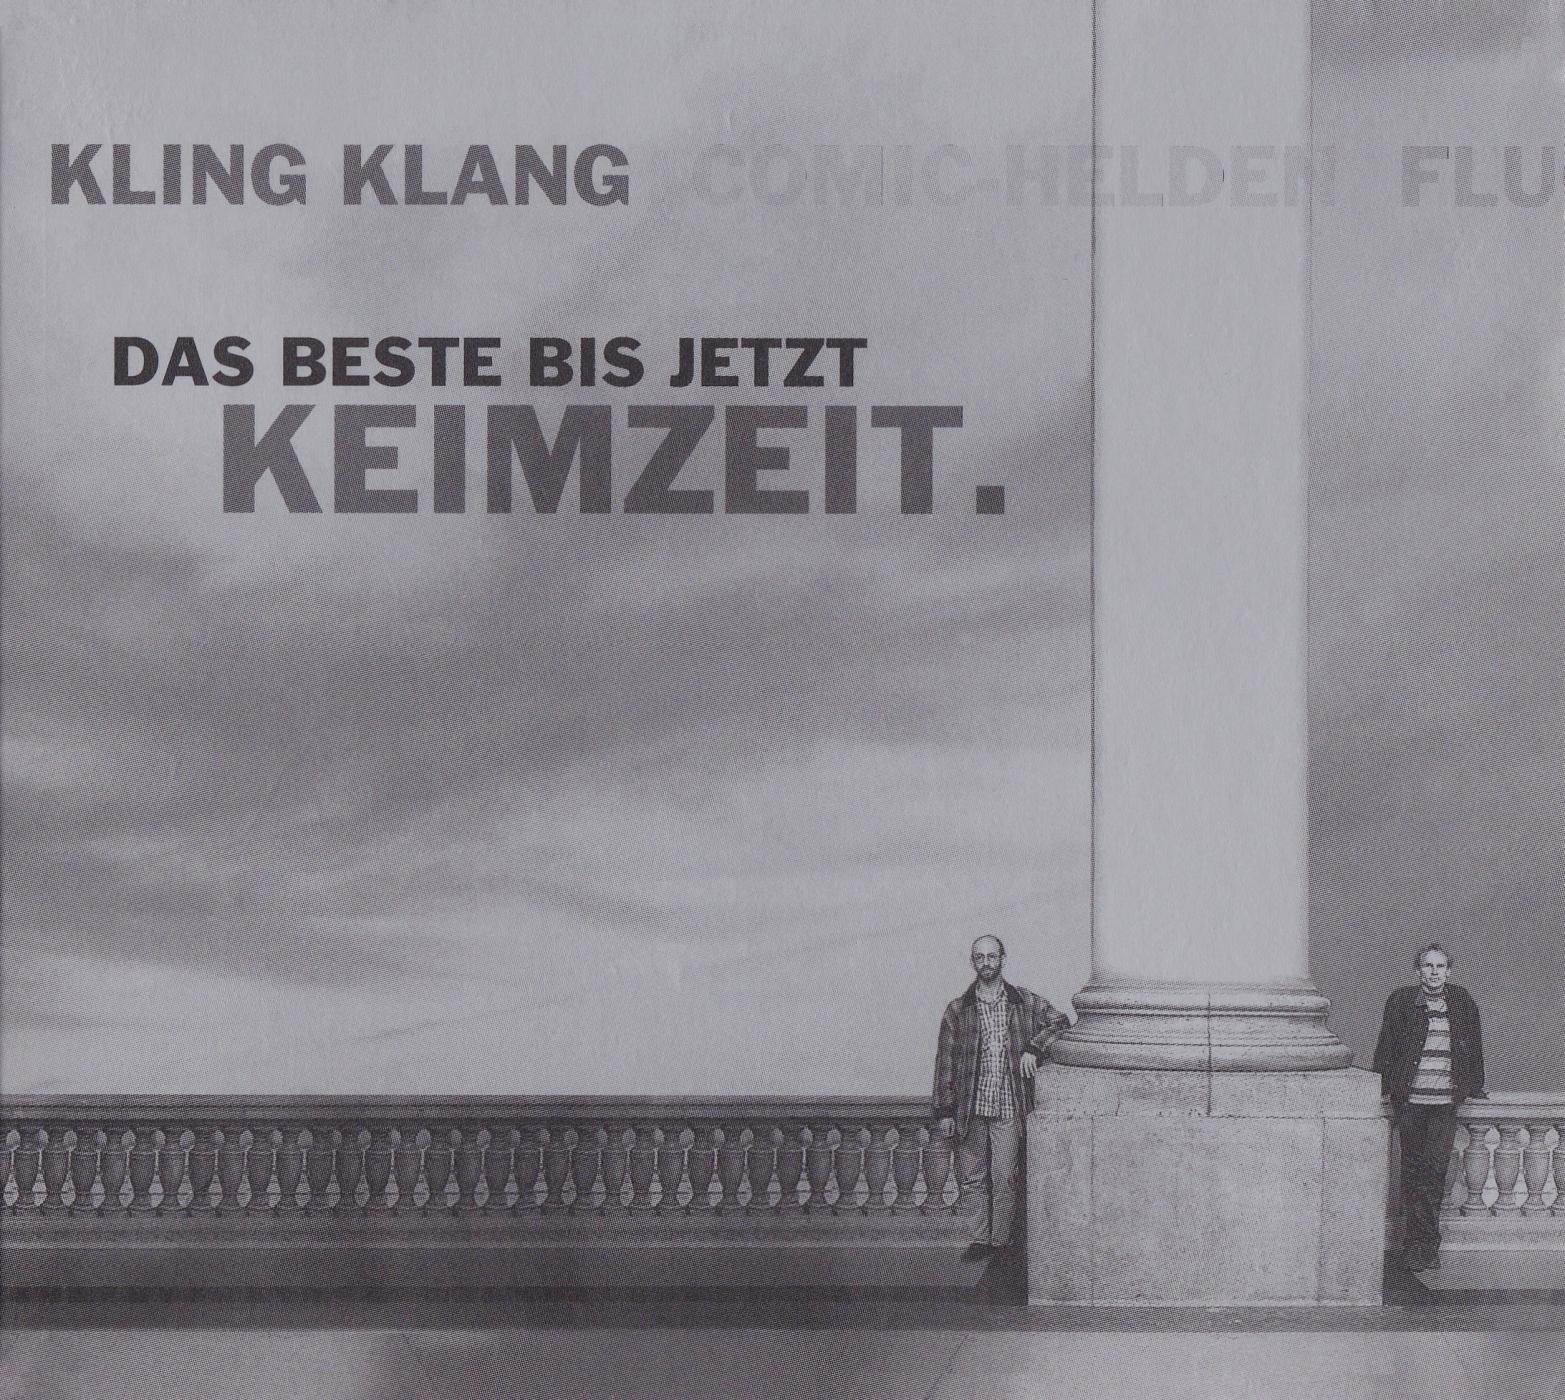 Keimzeit chords klang kling !!! Free